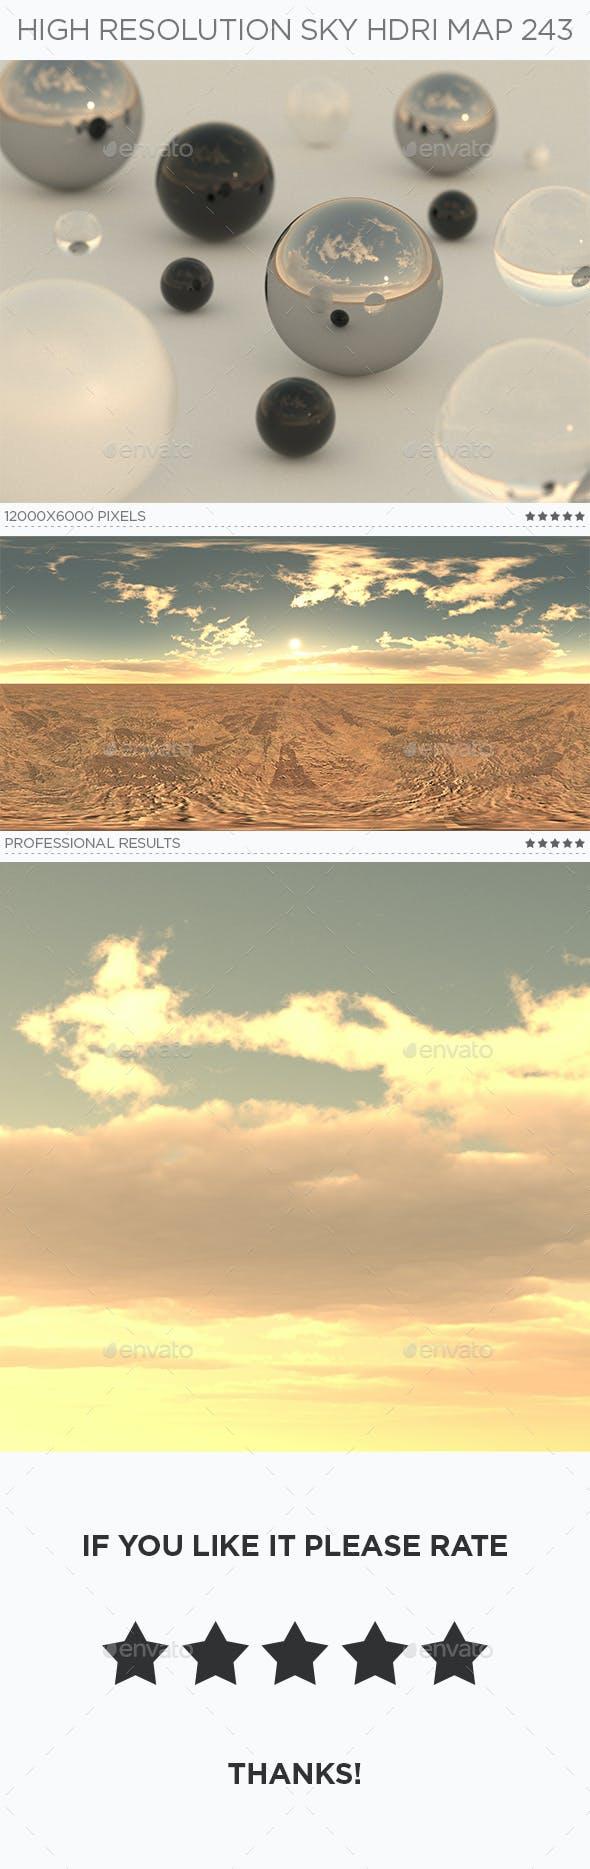 High Resolution Sky HDRi Map 243 - 3DOcean Item for Sale